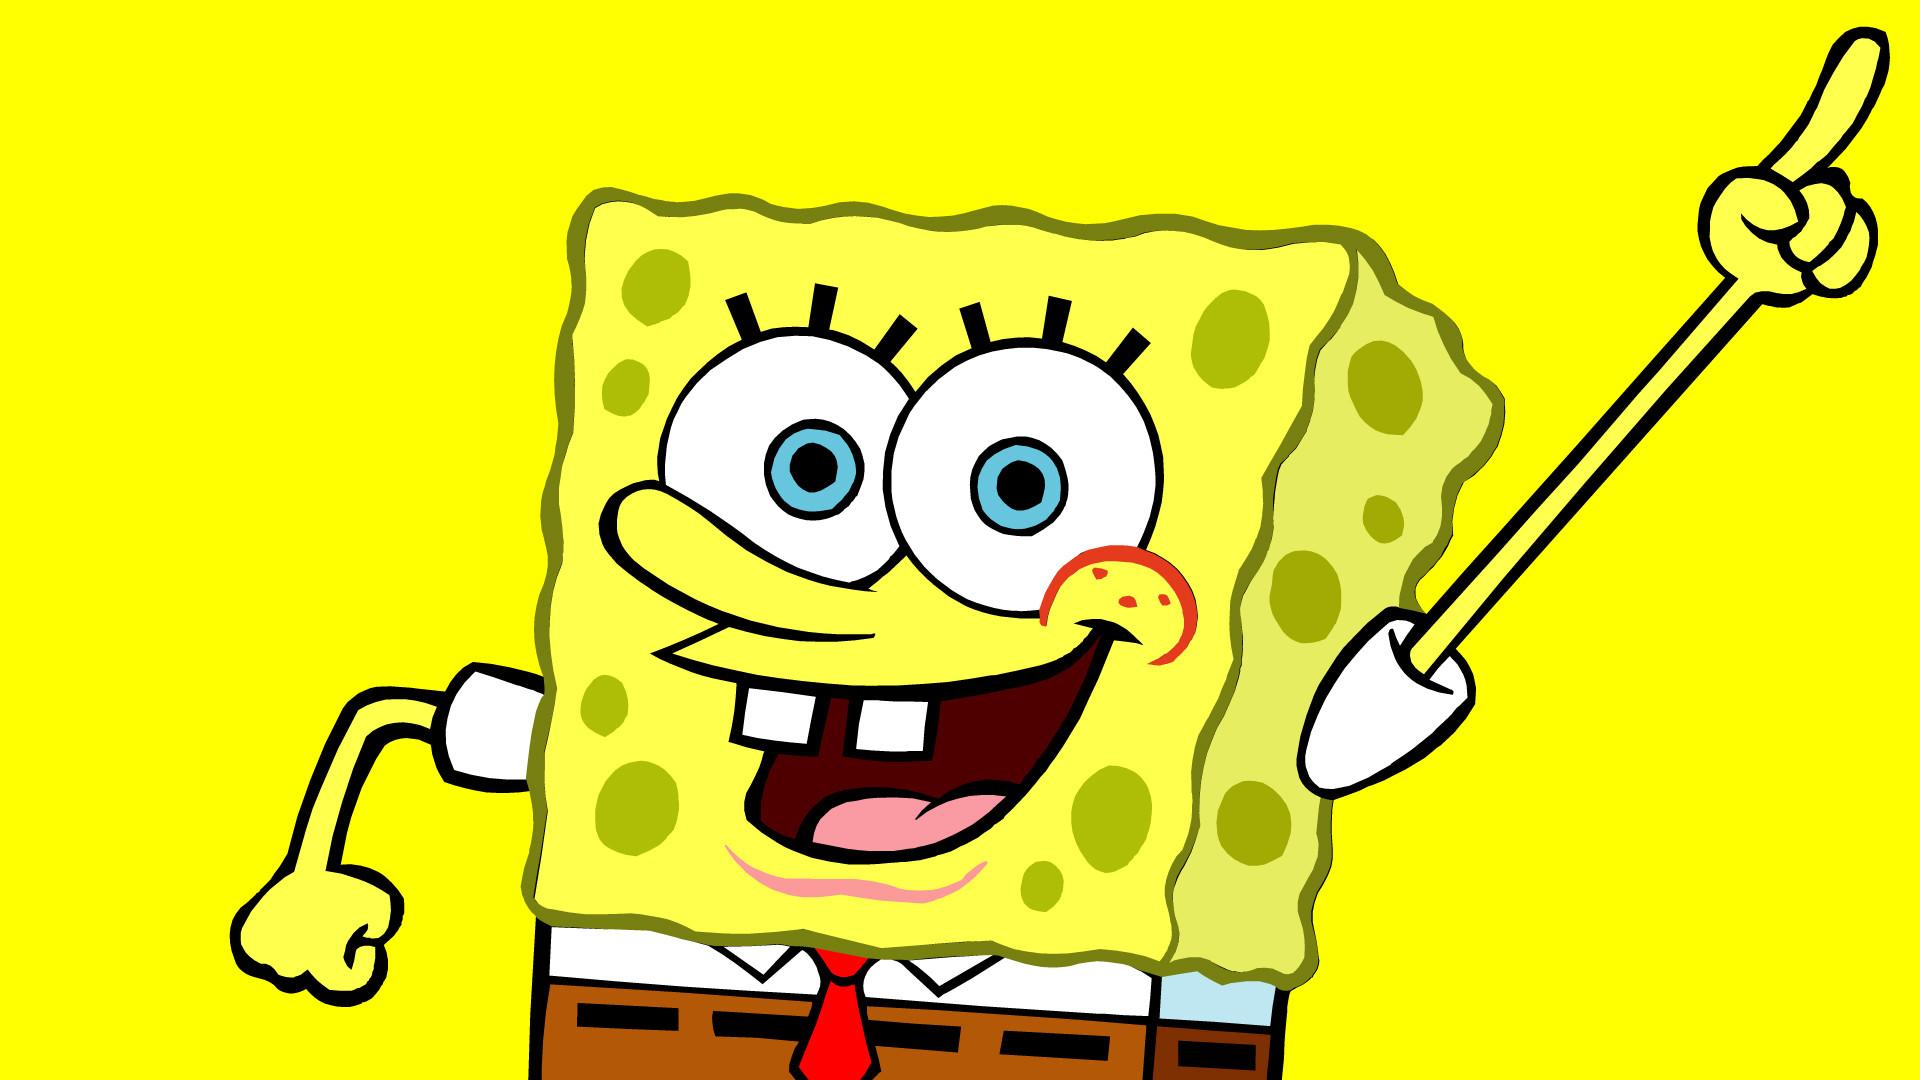 1080x1920 Wallpaper Samsung, Spongebob Squarepants, Wallpapers, Book, Tv, Save Screen, Samsung Galaxy S5, Wattpad, Funny